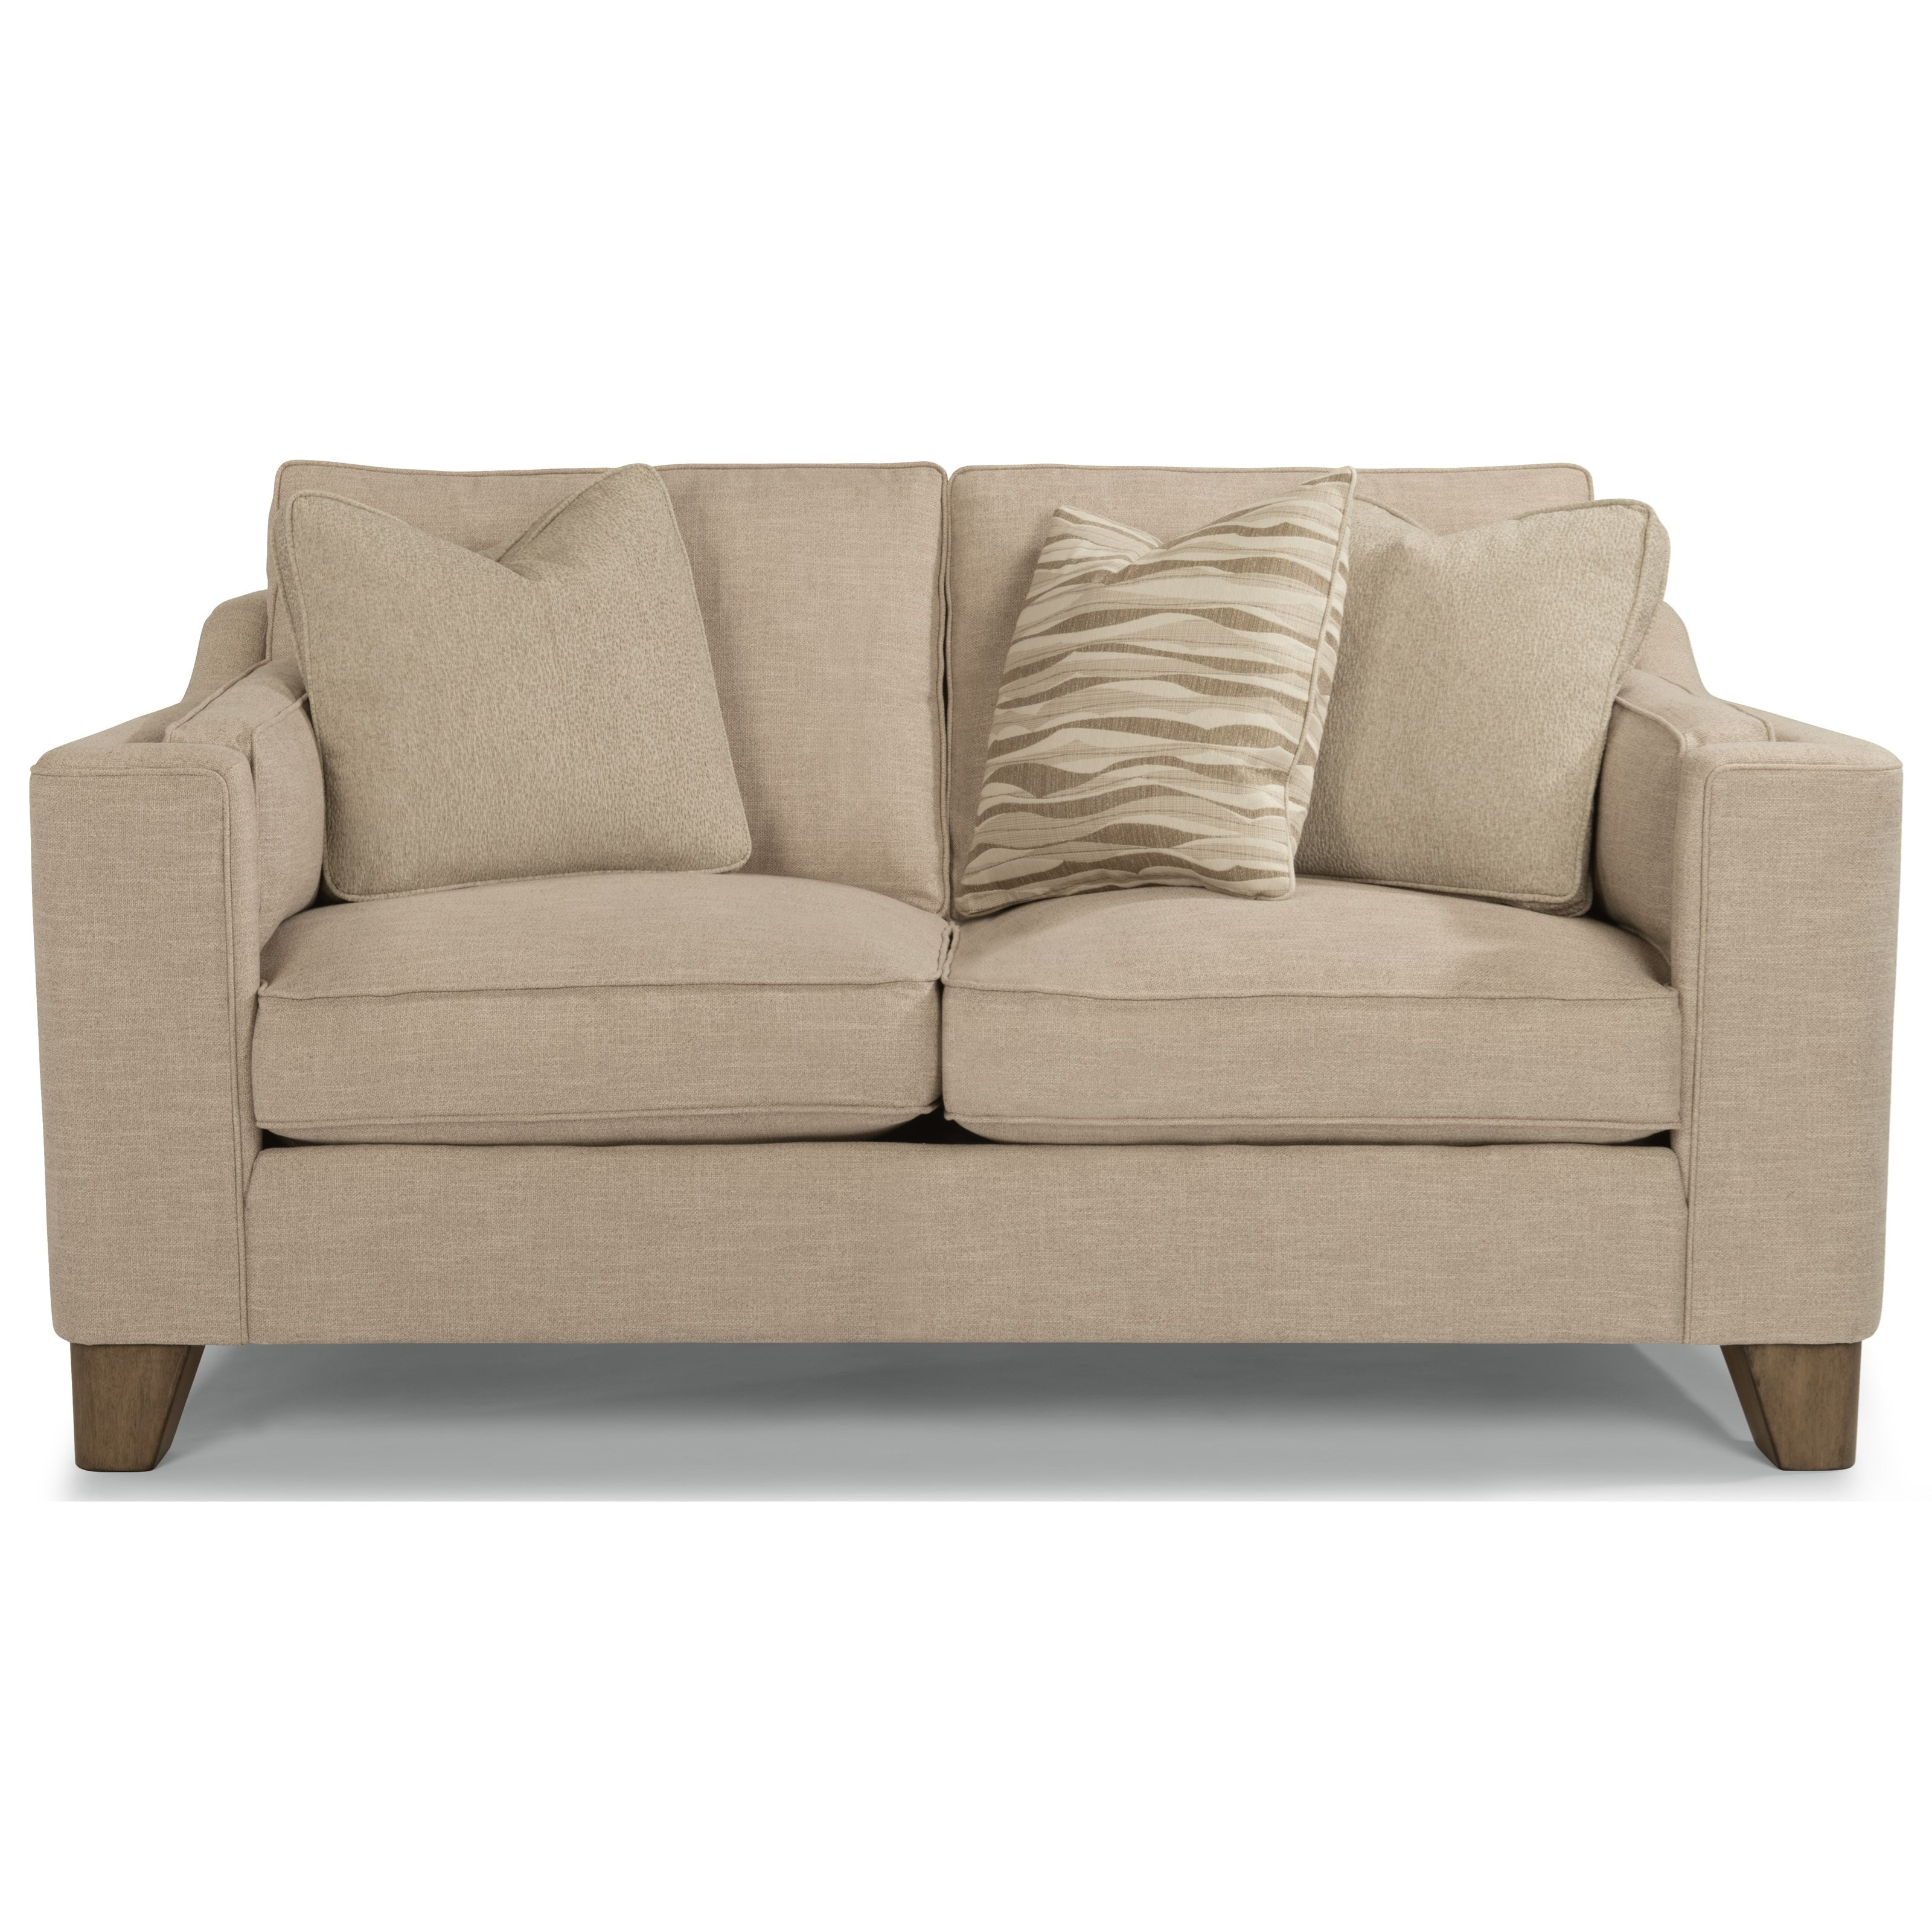 Flexsteel Arrow Love Seat - Item Number: 7105-20-560-80